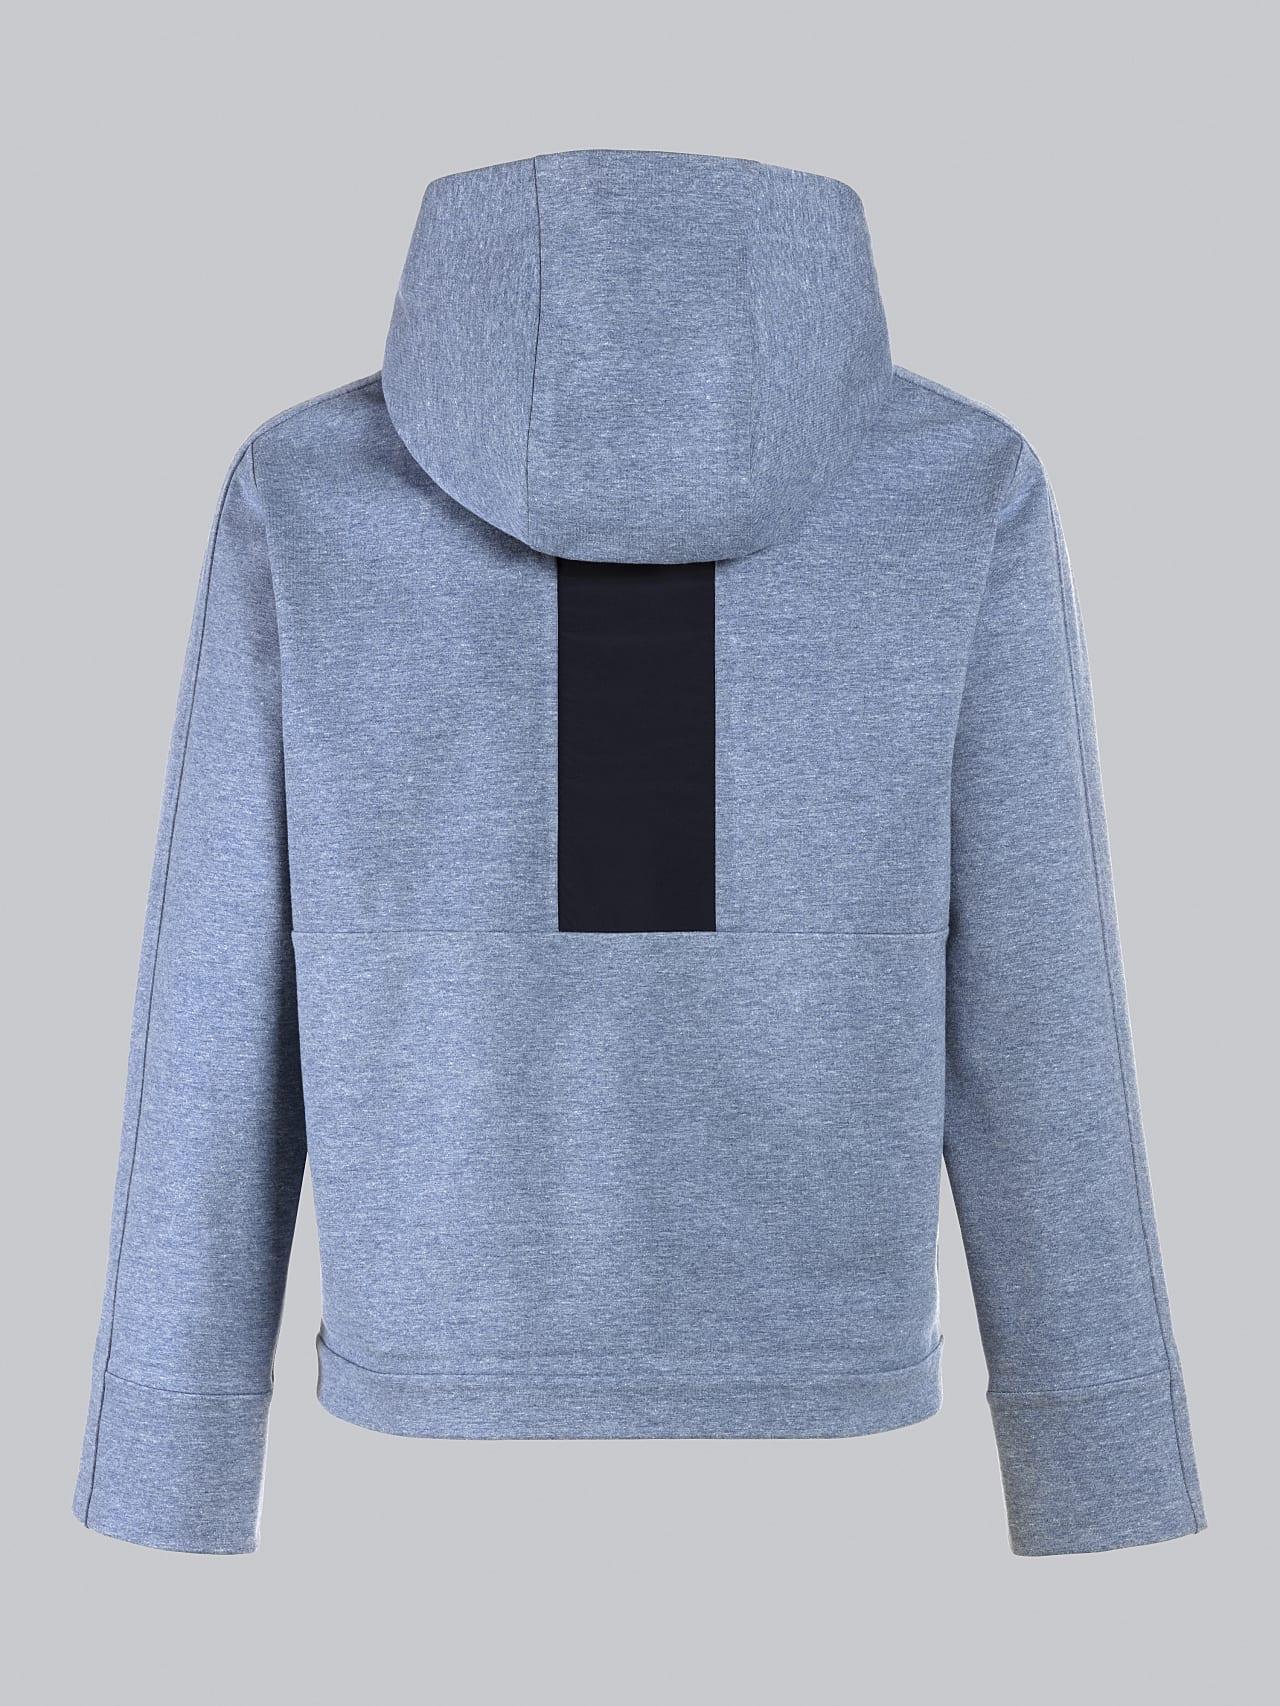 SINNO V2.Y5.02 Waterproof Hooded Jacket medium blue Left Alpha Tauri